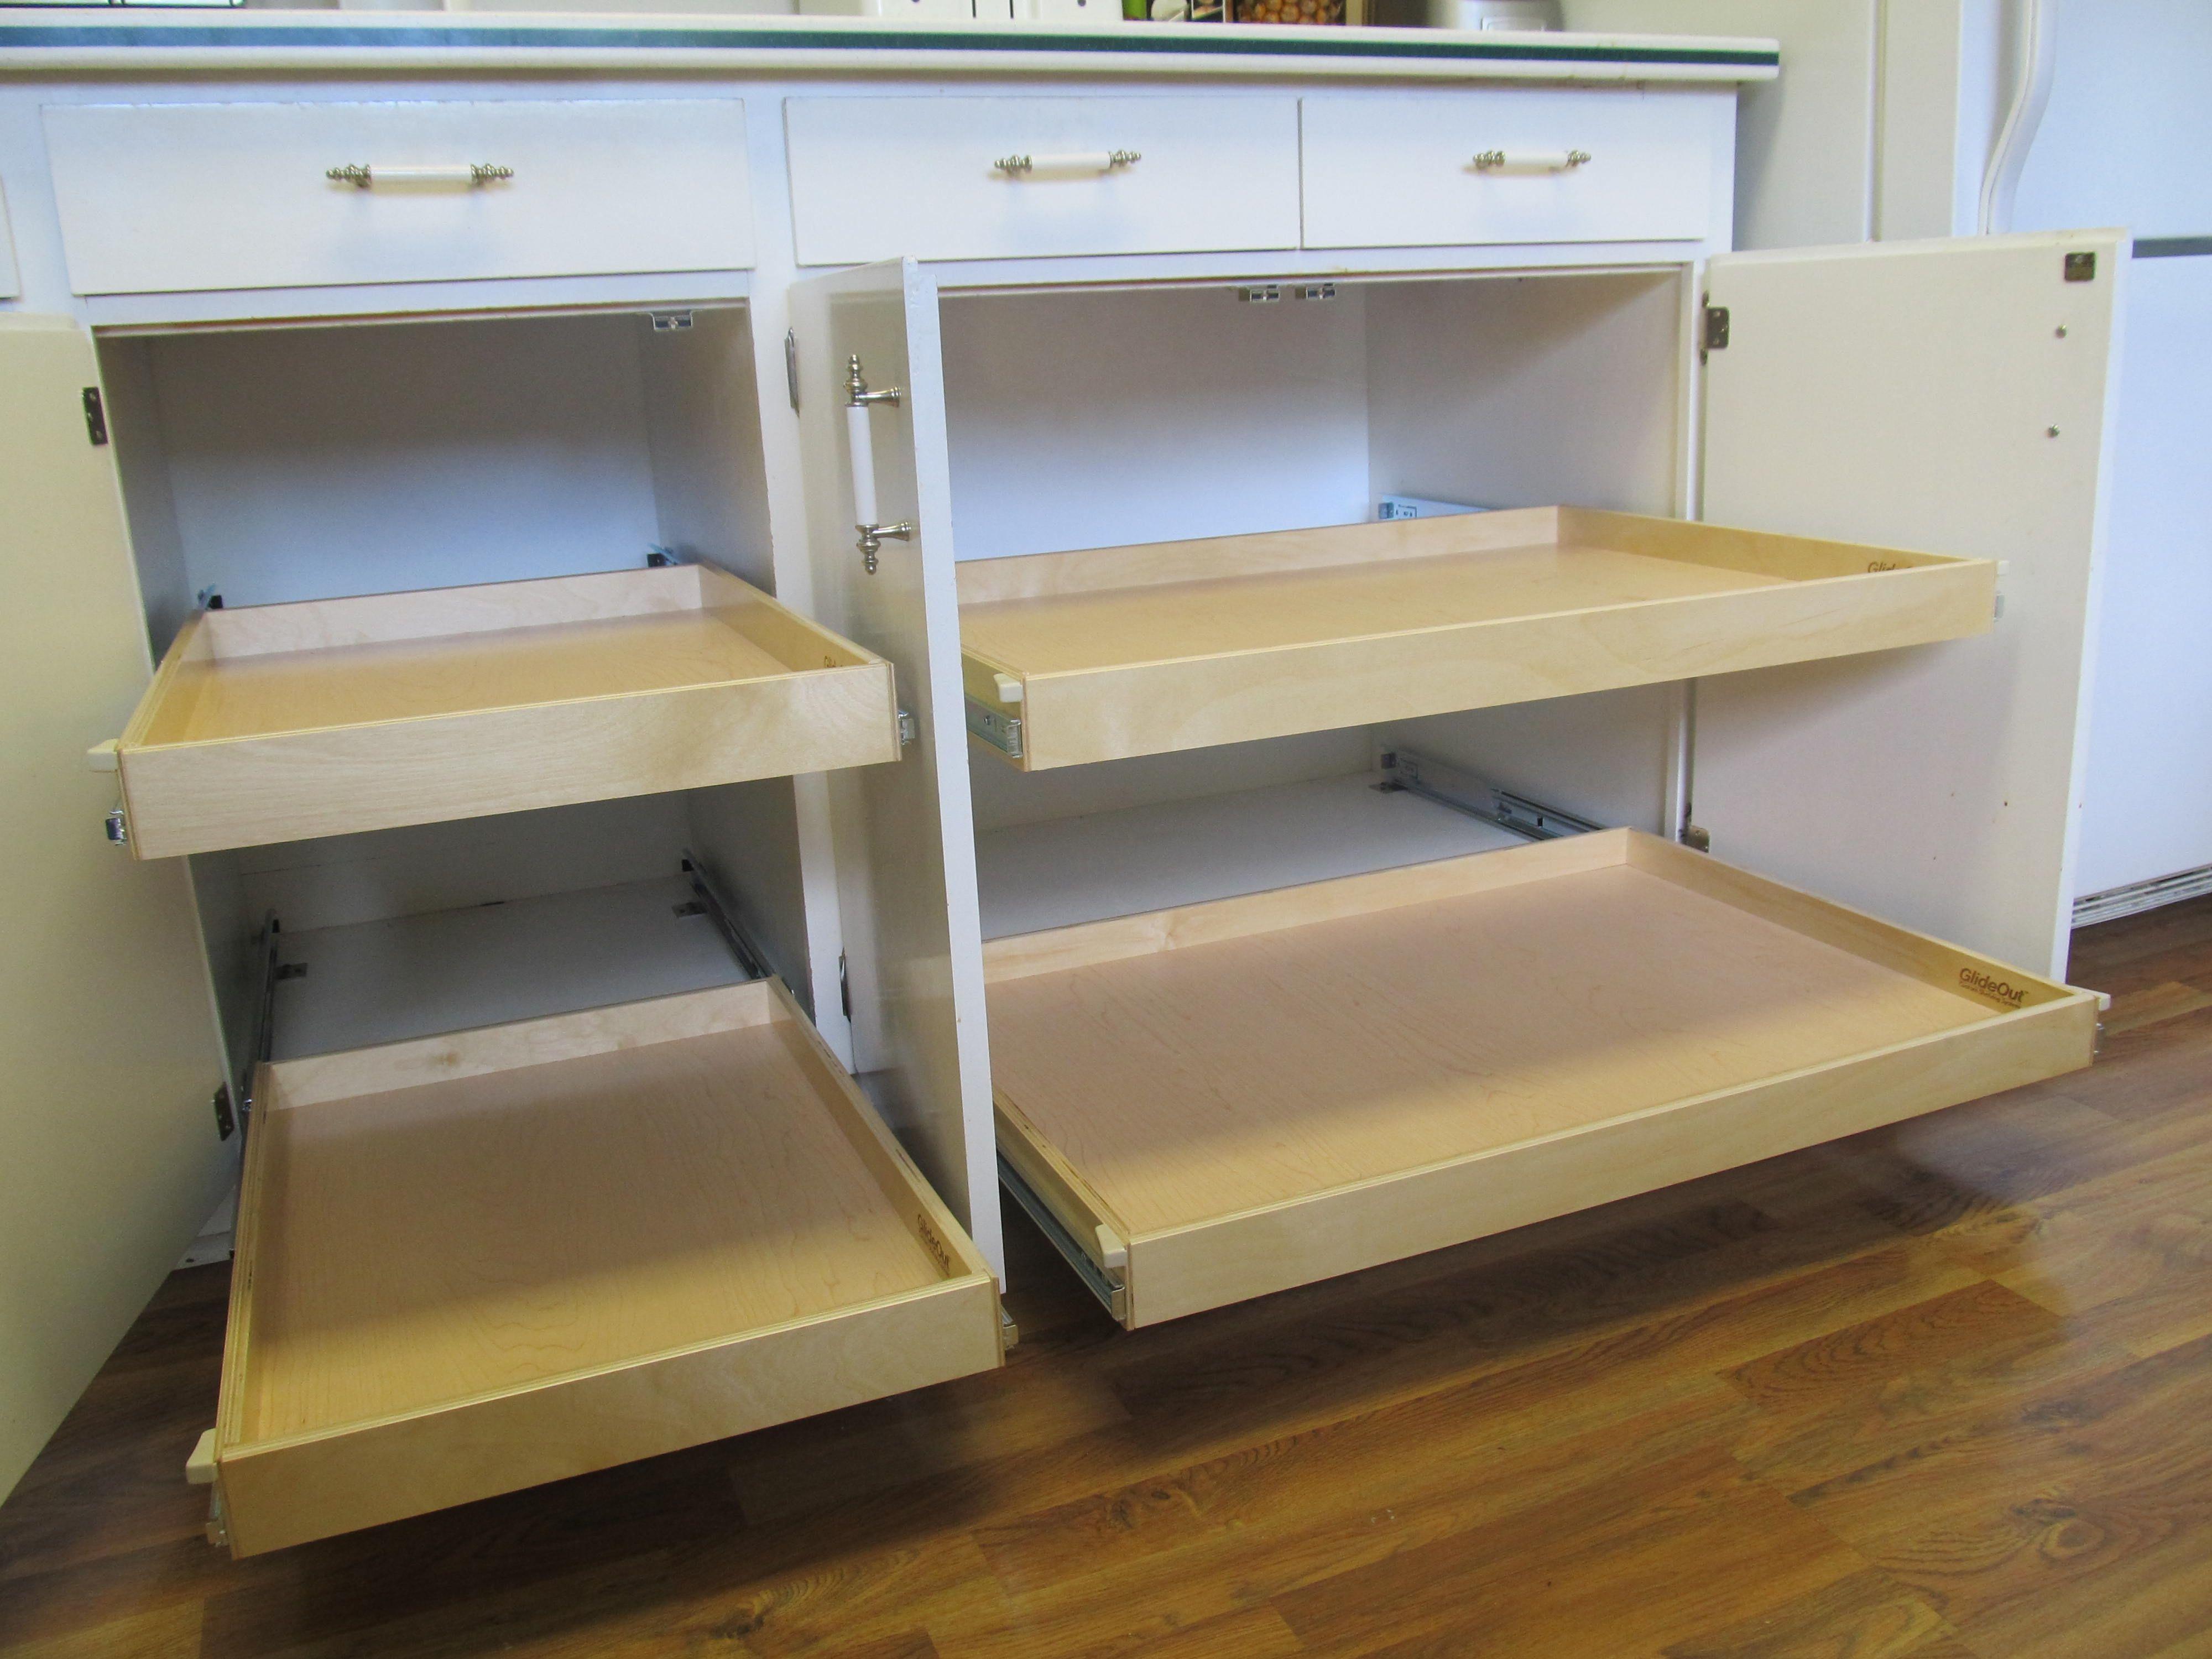 Best Kitchen Gallery: Sliding Shelves For Kitchen Cabi S B4 After Pinterest of Sliding Shelves For Kitchen Cabinets on cal-ite.com